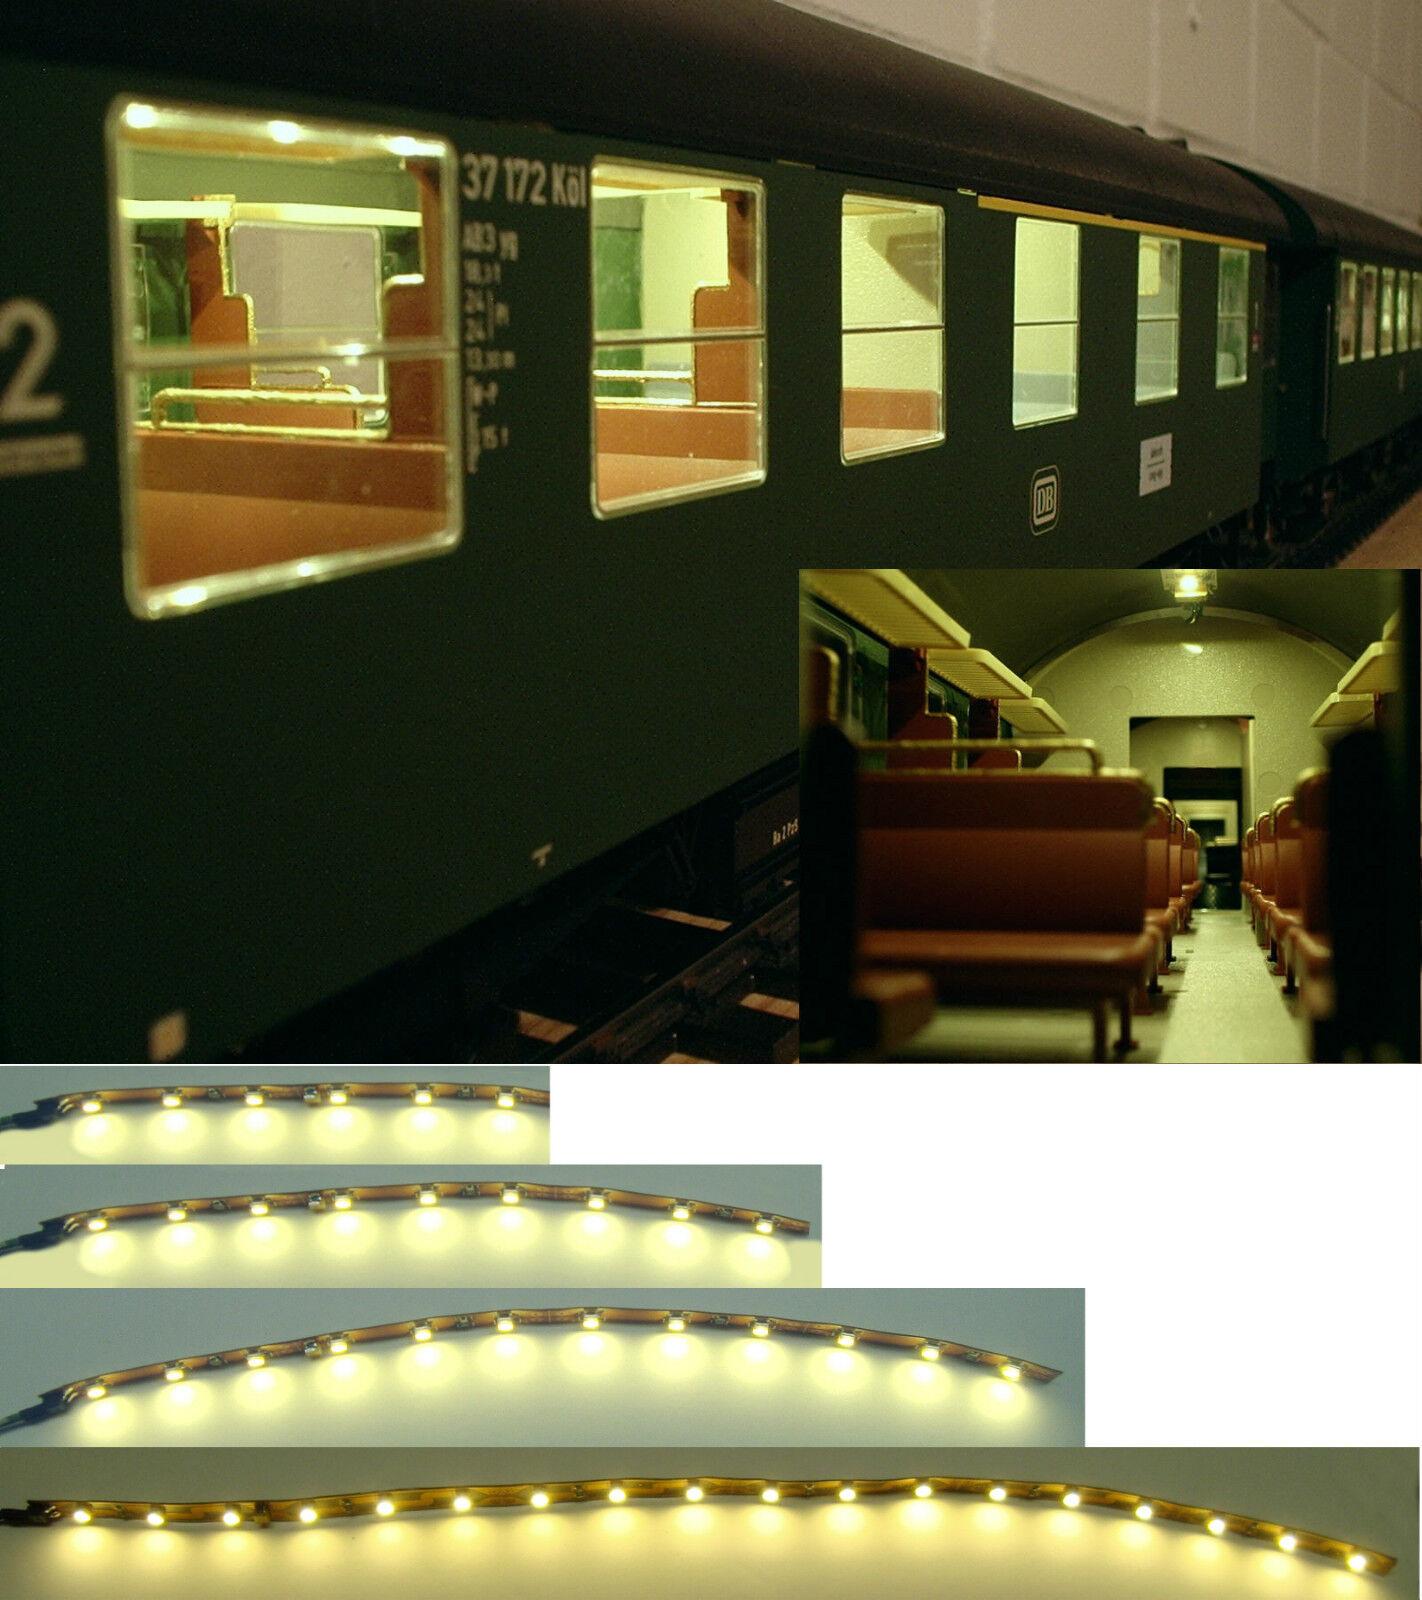 LED Personenwagen Beleuchtung Waggonbeleuchtung warmwhite  analog & digital